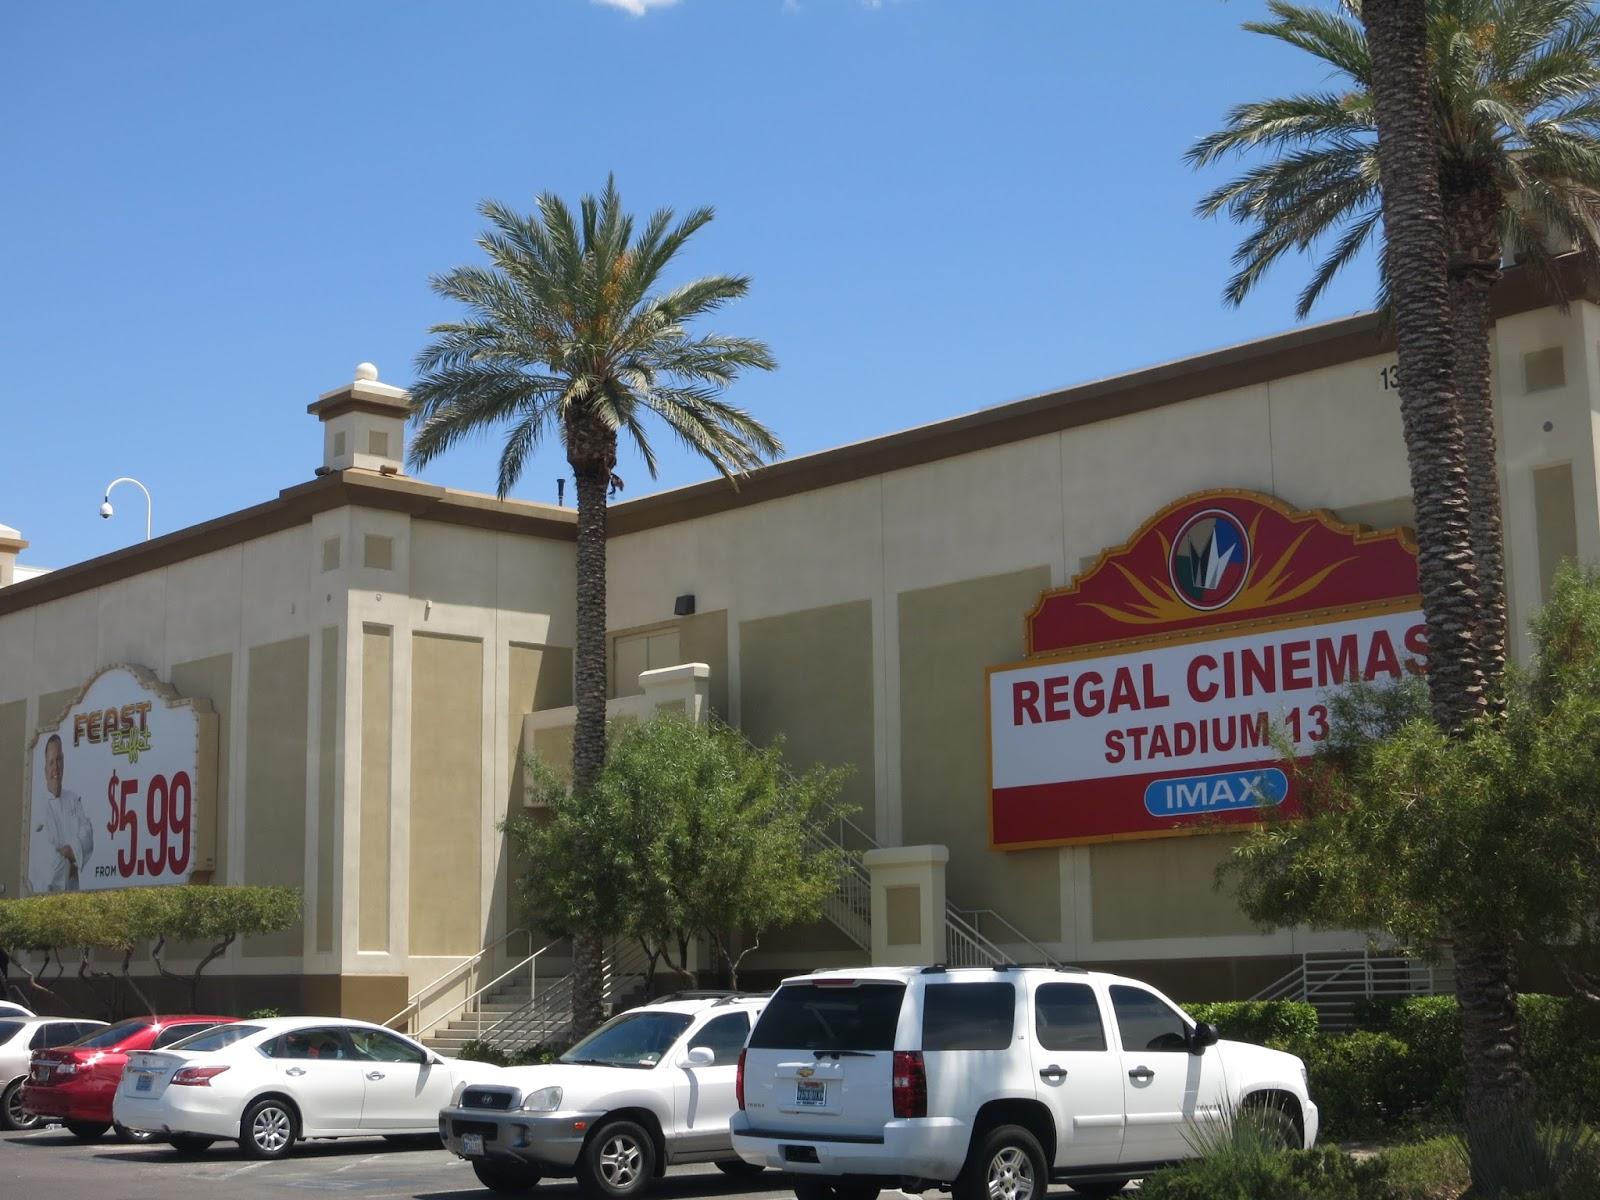 Galaxy theatres green valley cinema henderson nv reviews - Regal Cinemas At Sunset Station